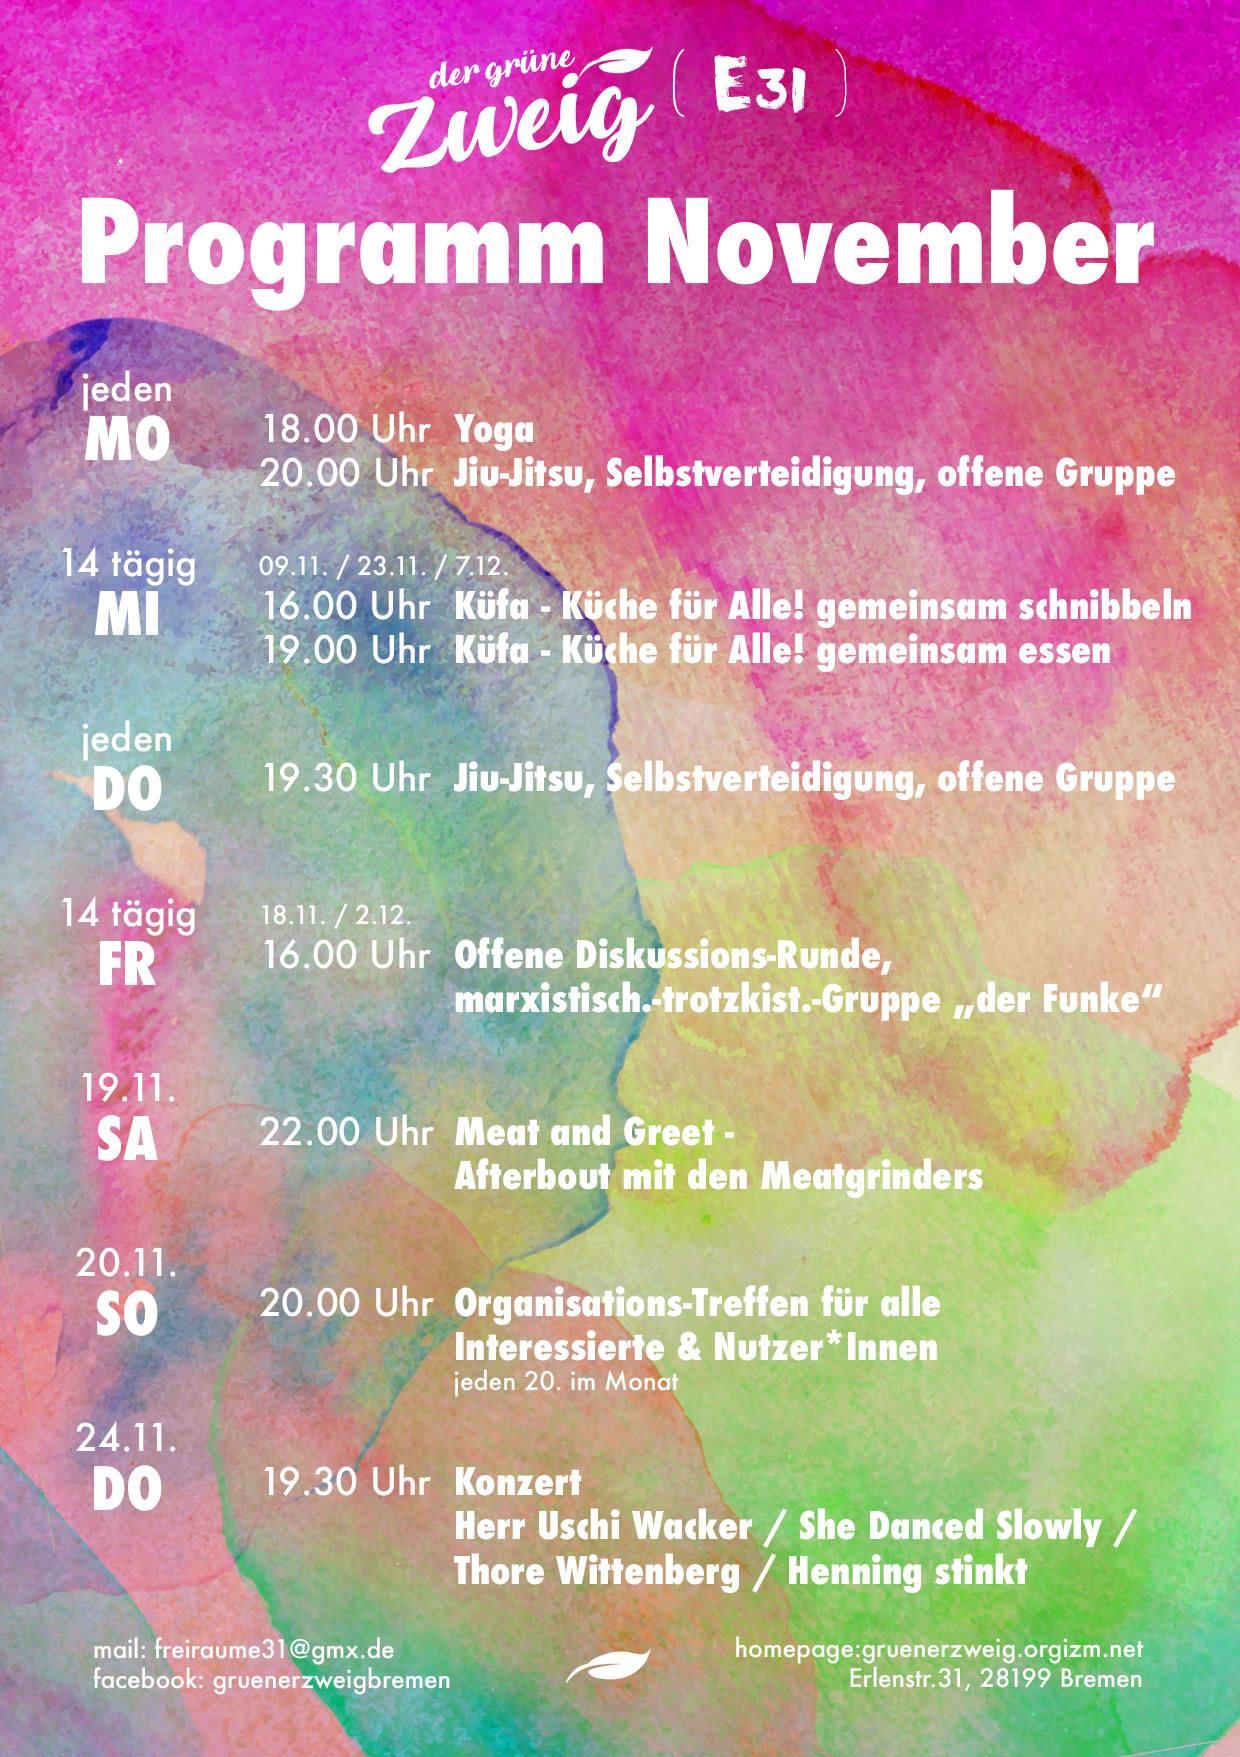 Programm November 2016